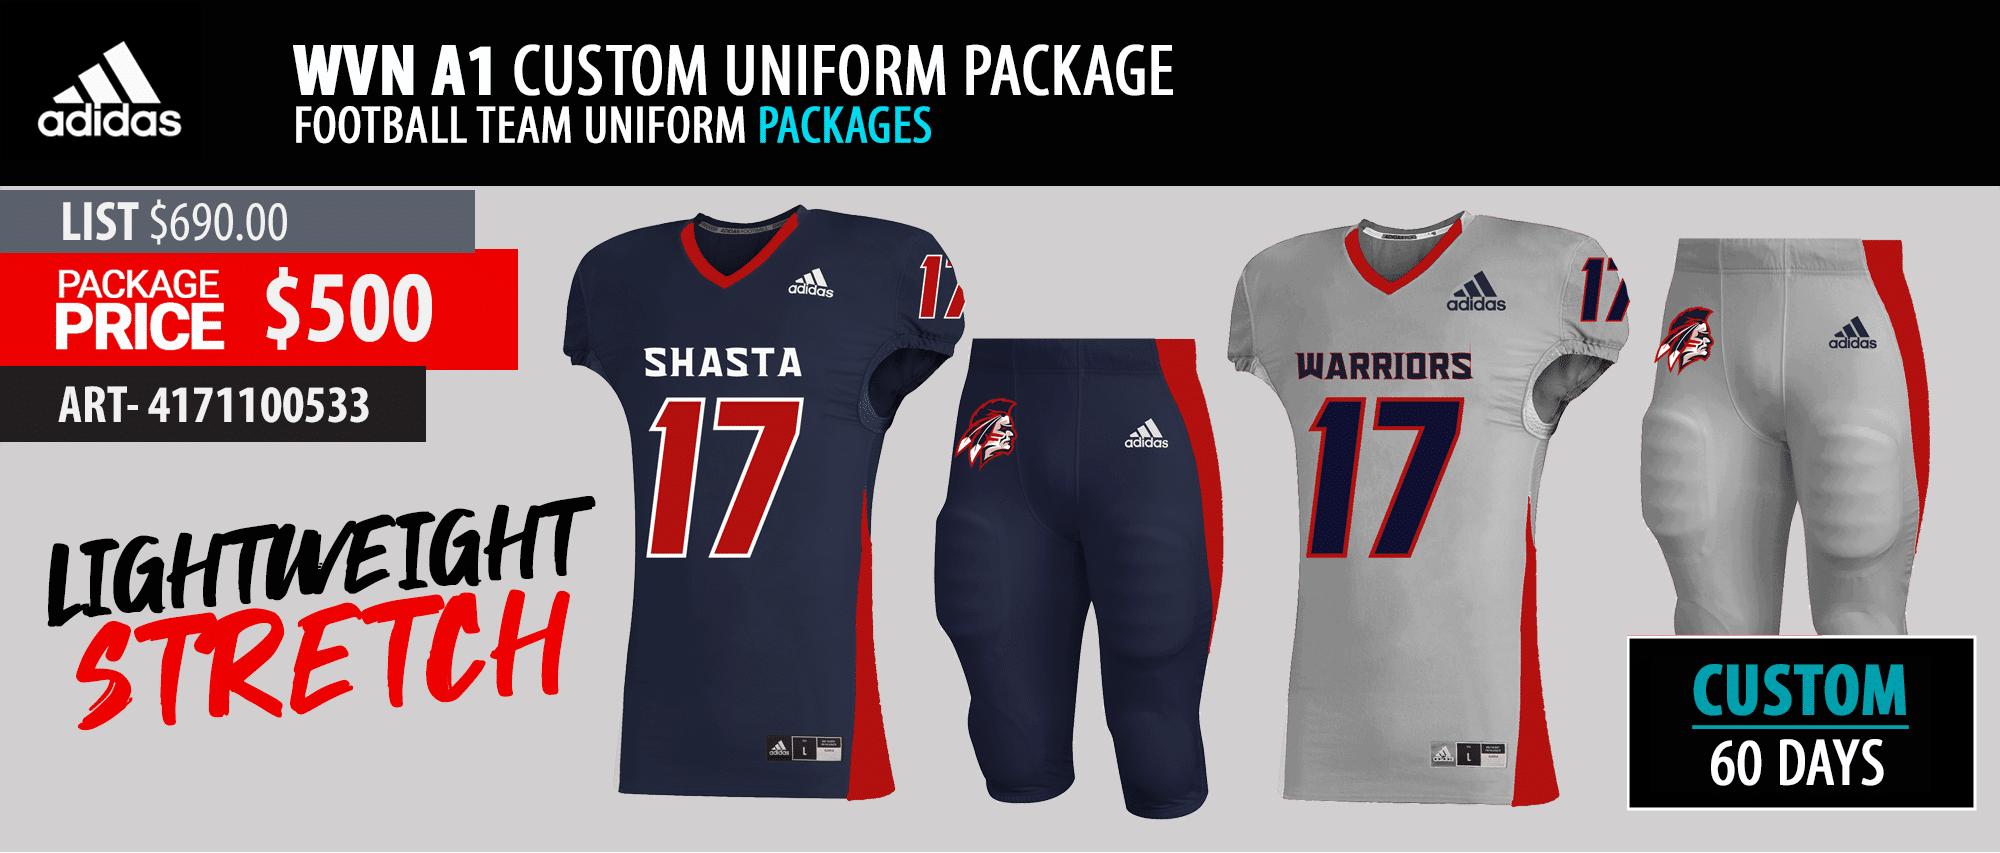 Adidas Adult Read Option - Twill Football Uniform Package